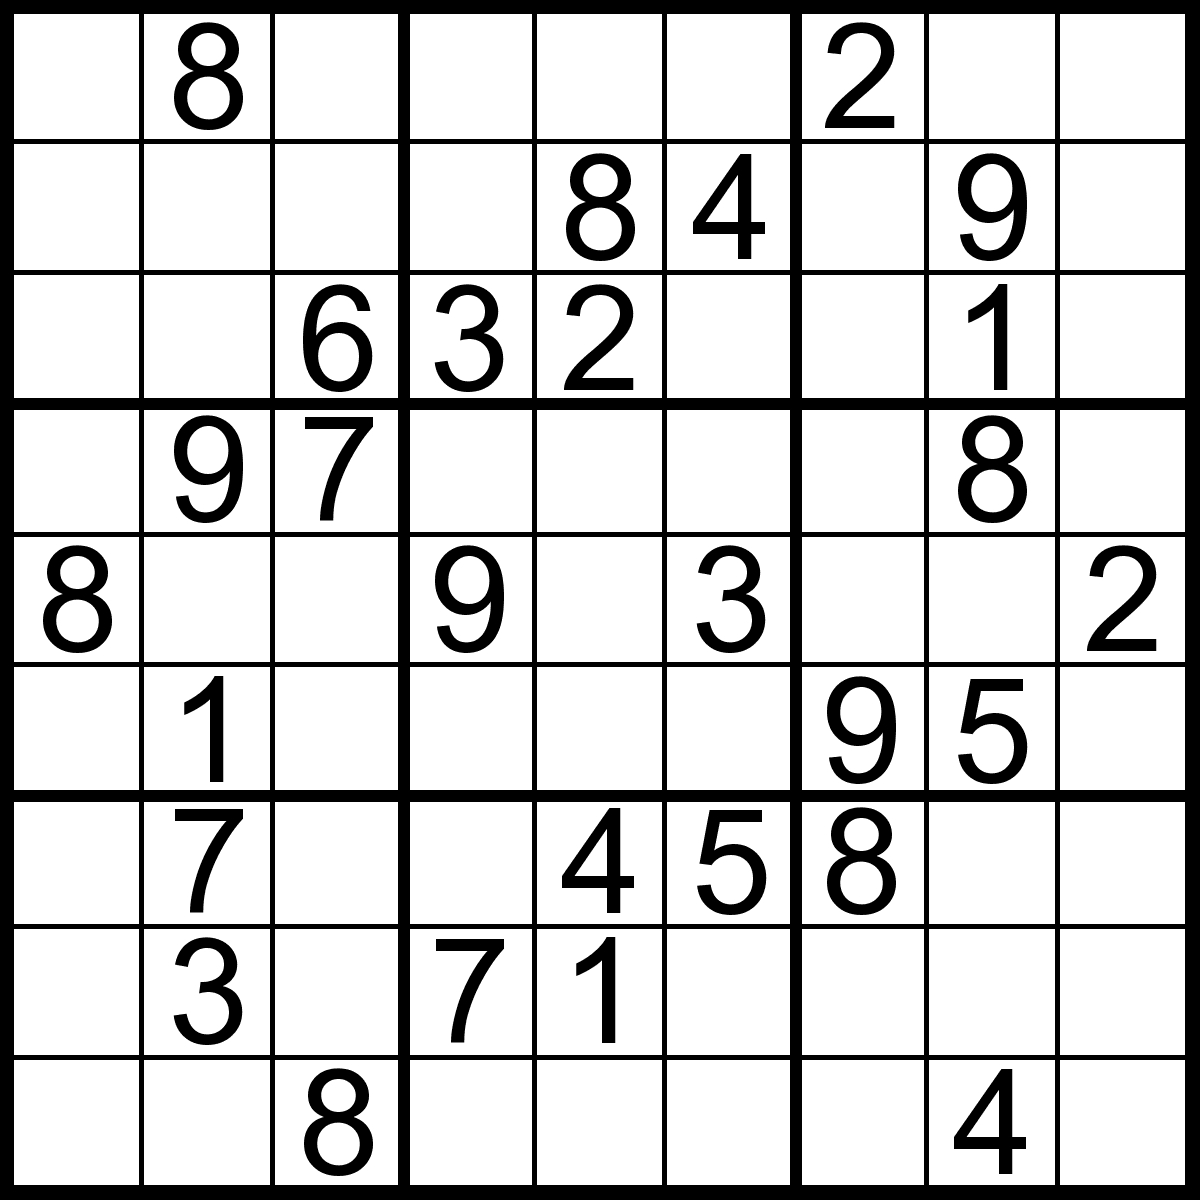 Sudoku Printable Puzzles - Yahoo Image Search Results   Puzzles For - Download Printable Sudoku Puzzles Free